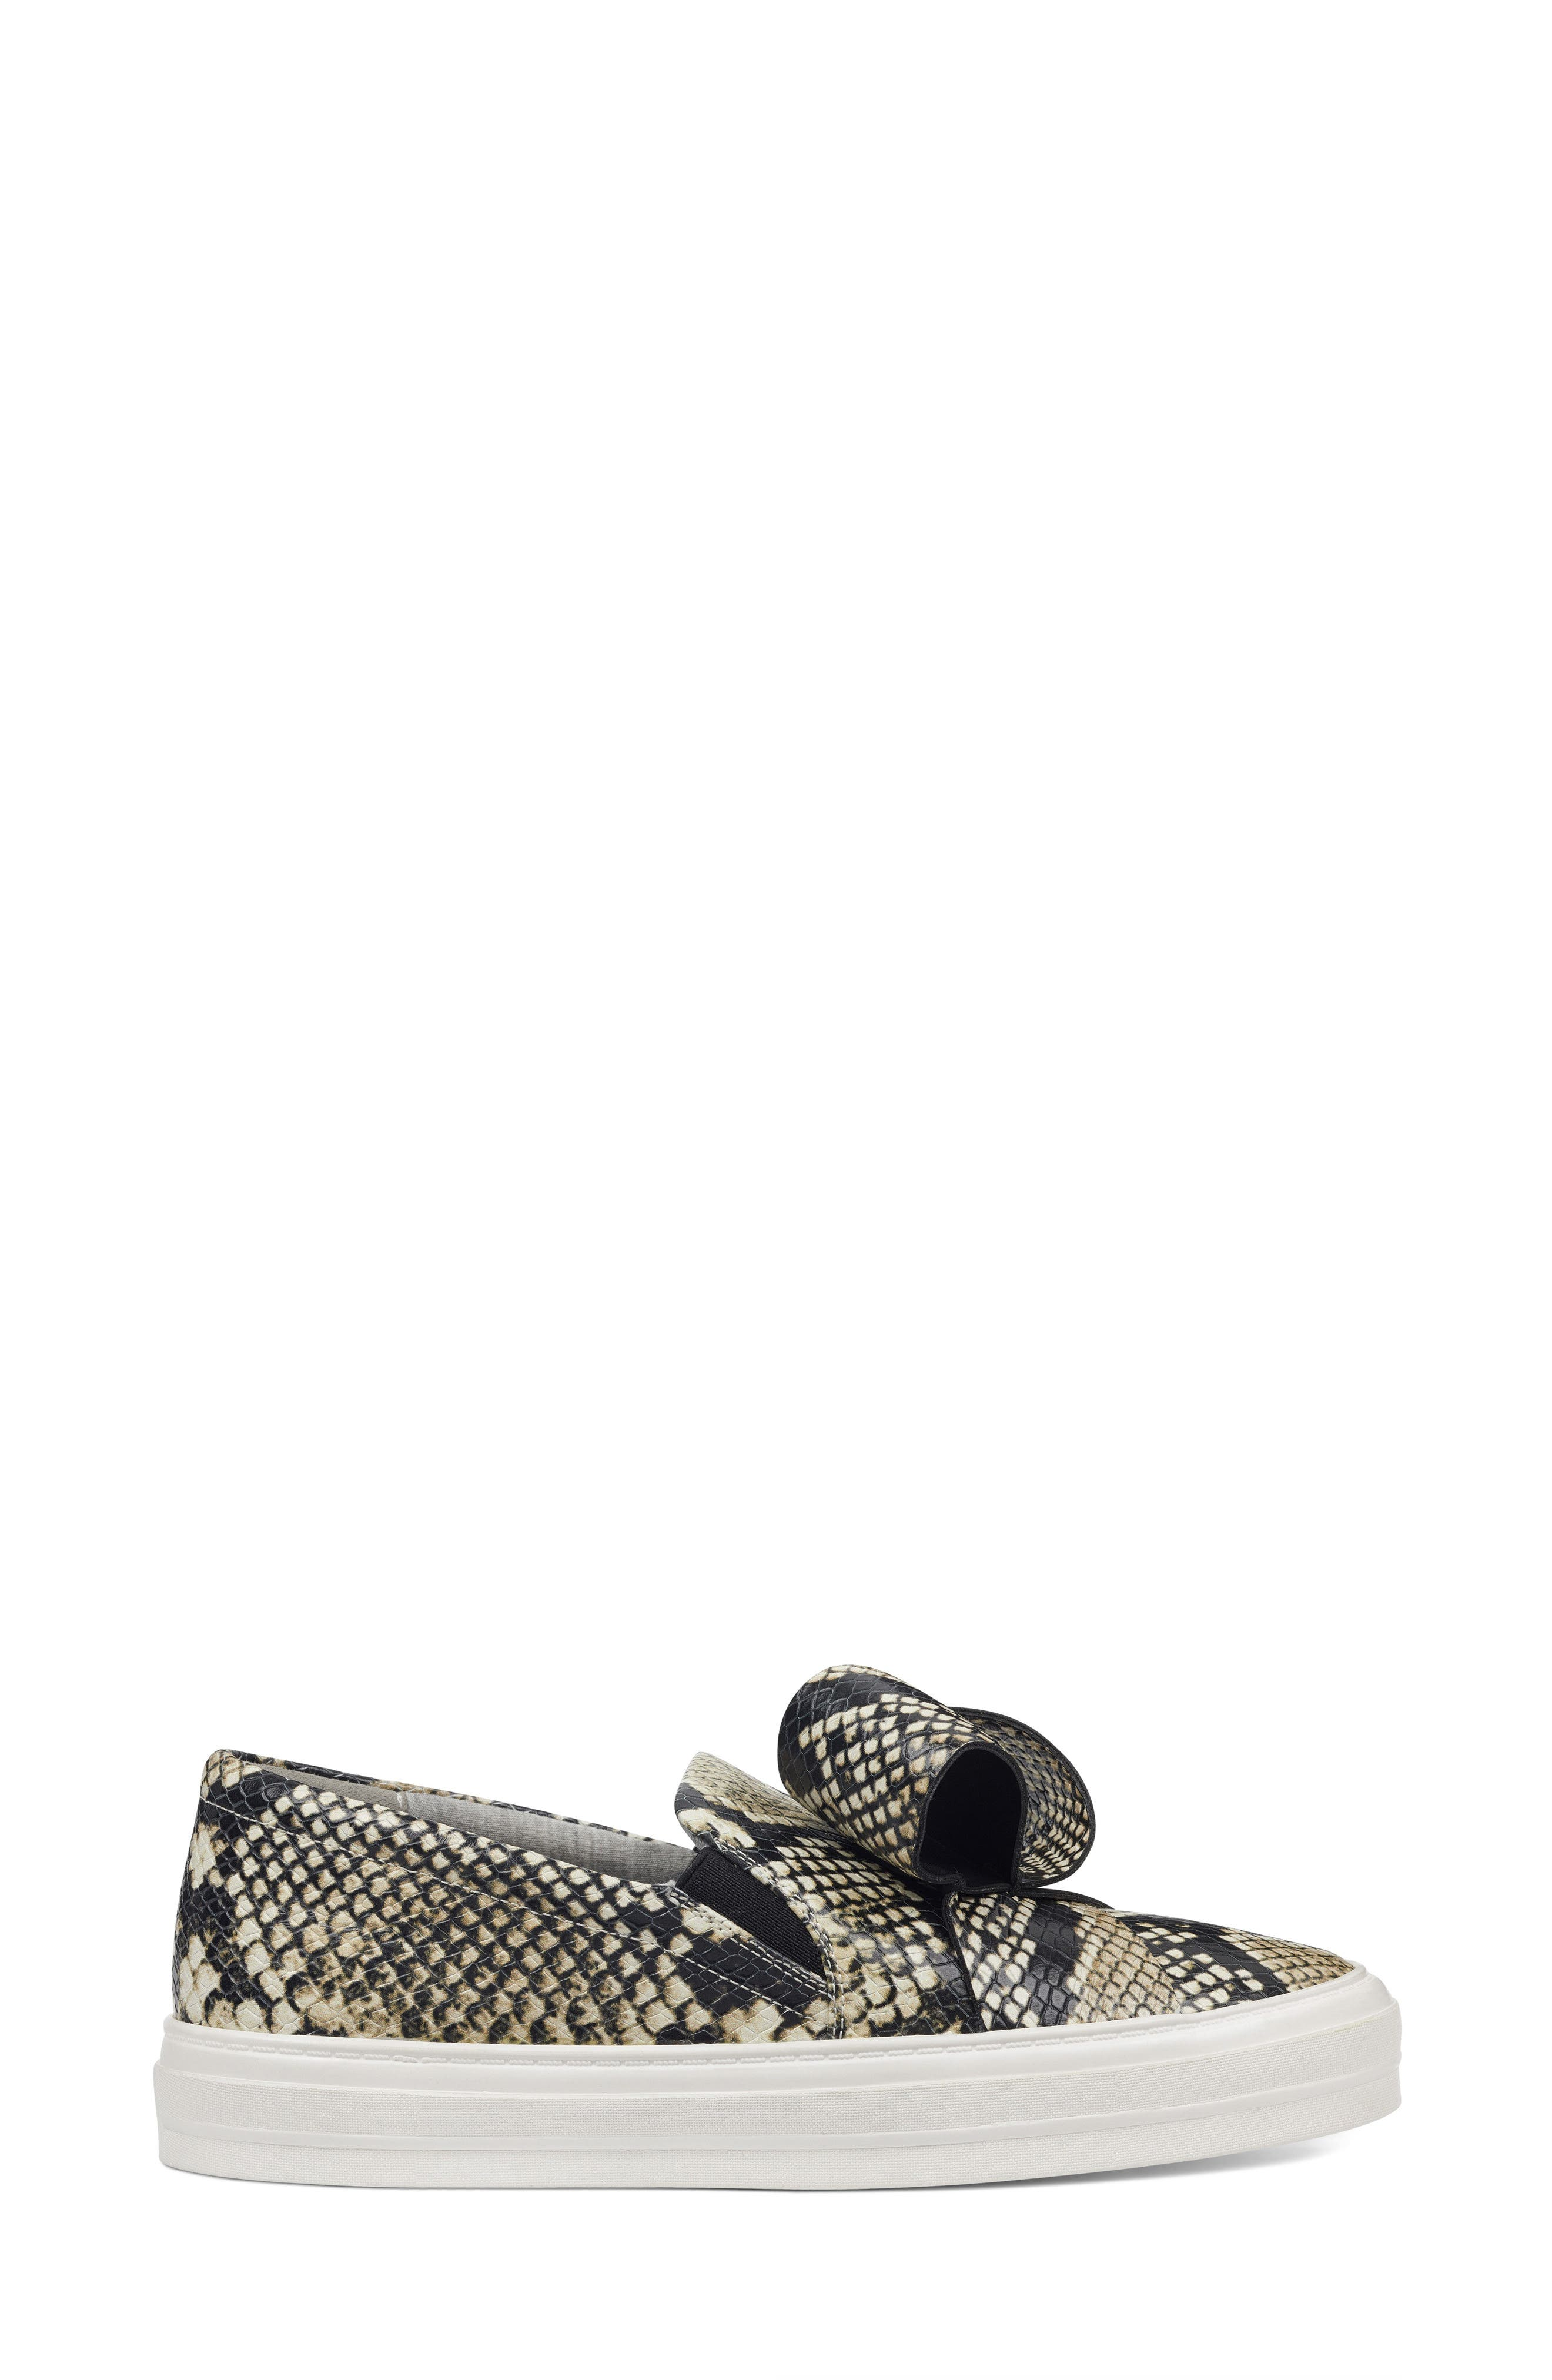 Odienella Slip-On Sneaker,                             Alternate thumbnail 3, color,                             Off White Multi Leather